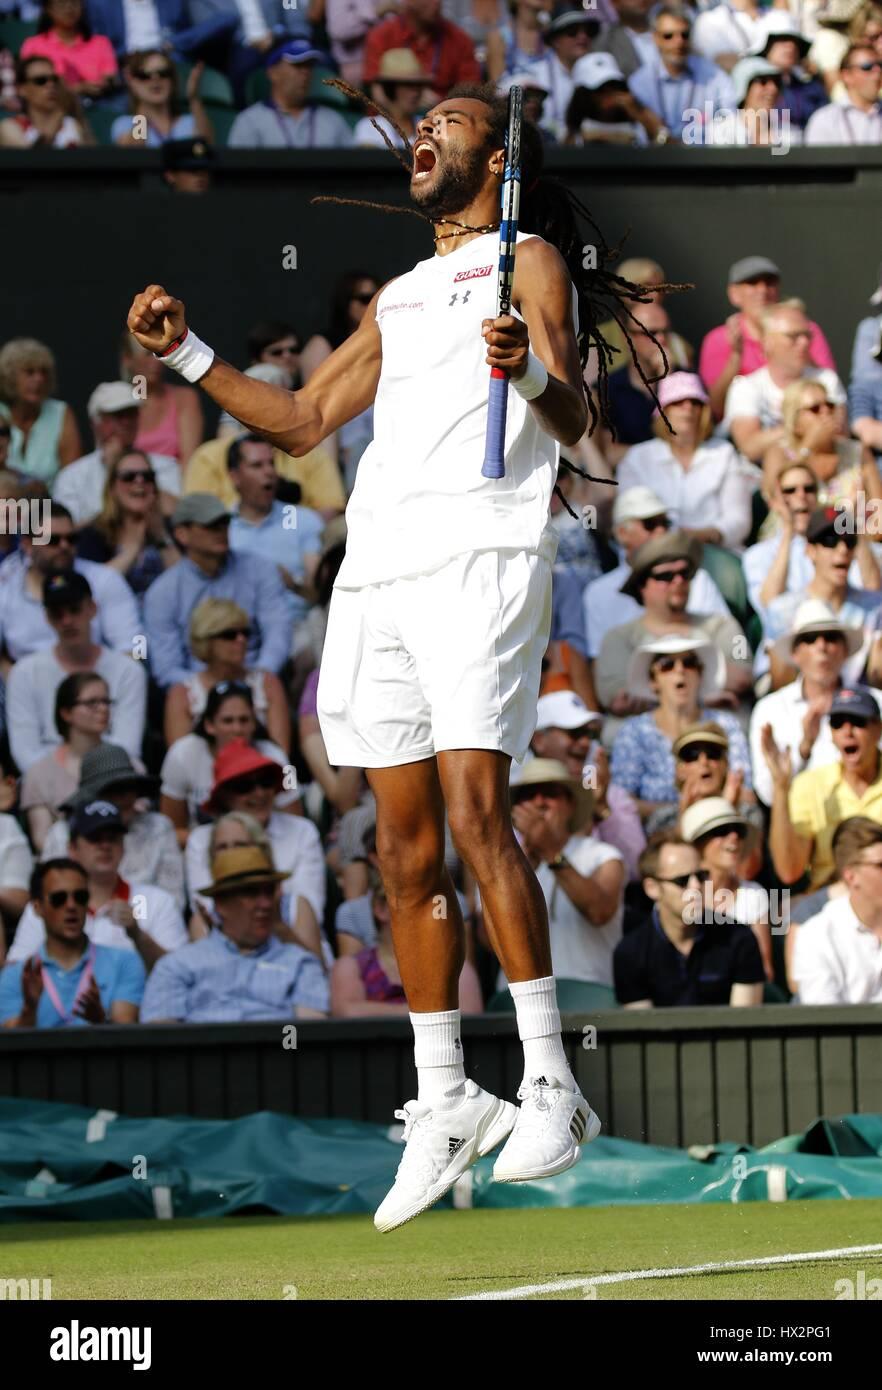 DUSTIN BROWN, jugador de tenis del All England Club de Tenis de Wimbledon en Londres, Inglaterra, 02 de julio de 2015 Foto de stock